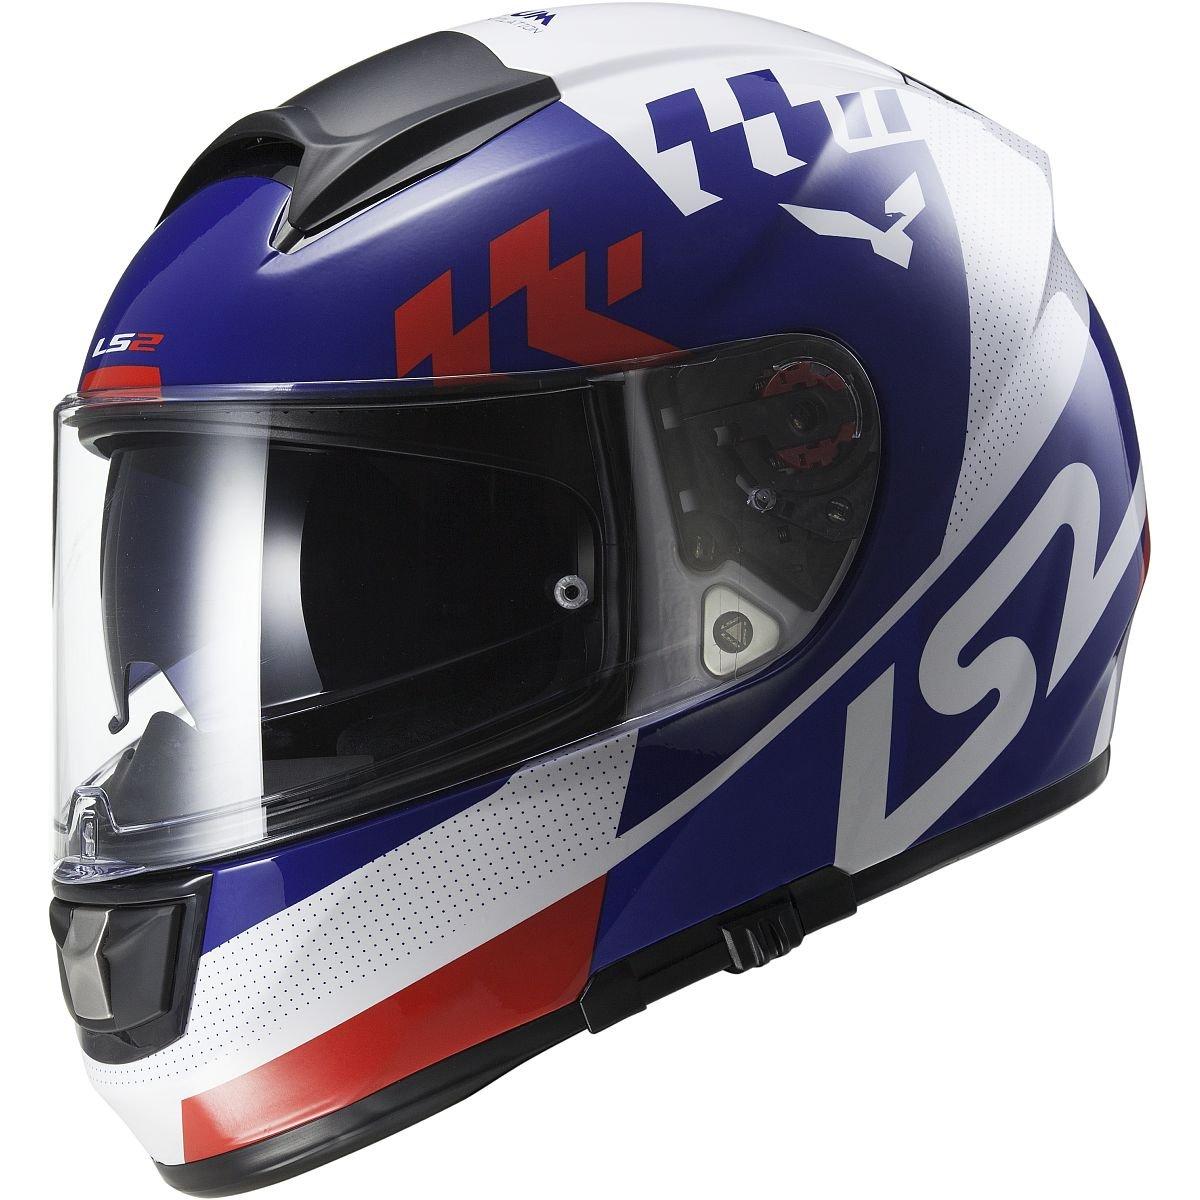 LS2 Helmets Vector Podium Full Face Motorcycle Helmet with Sunshield (White/Blue, Medium) 397-6103